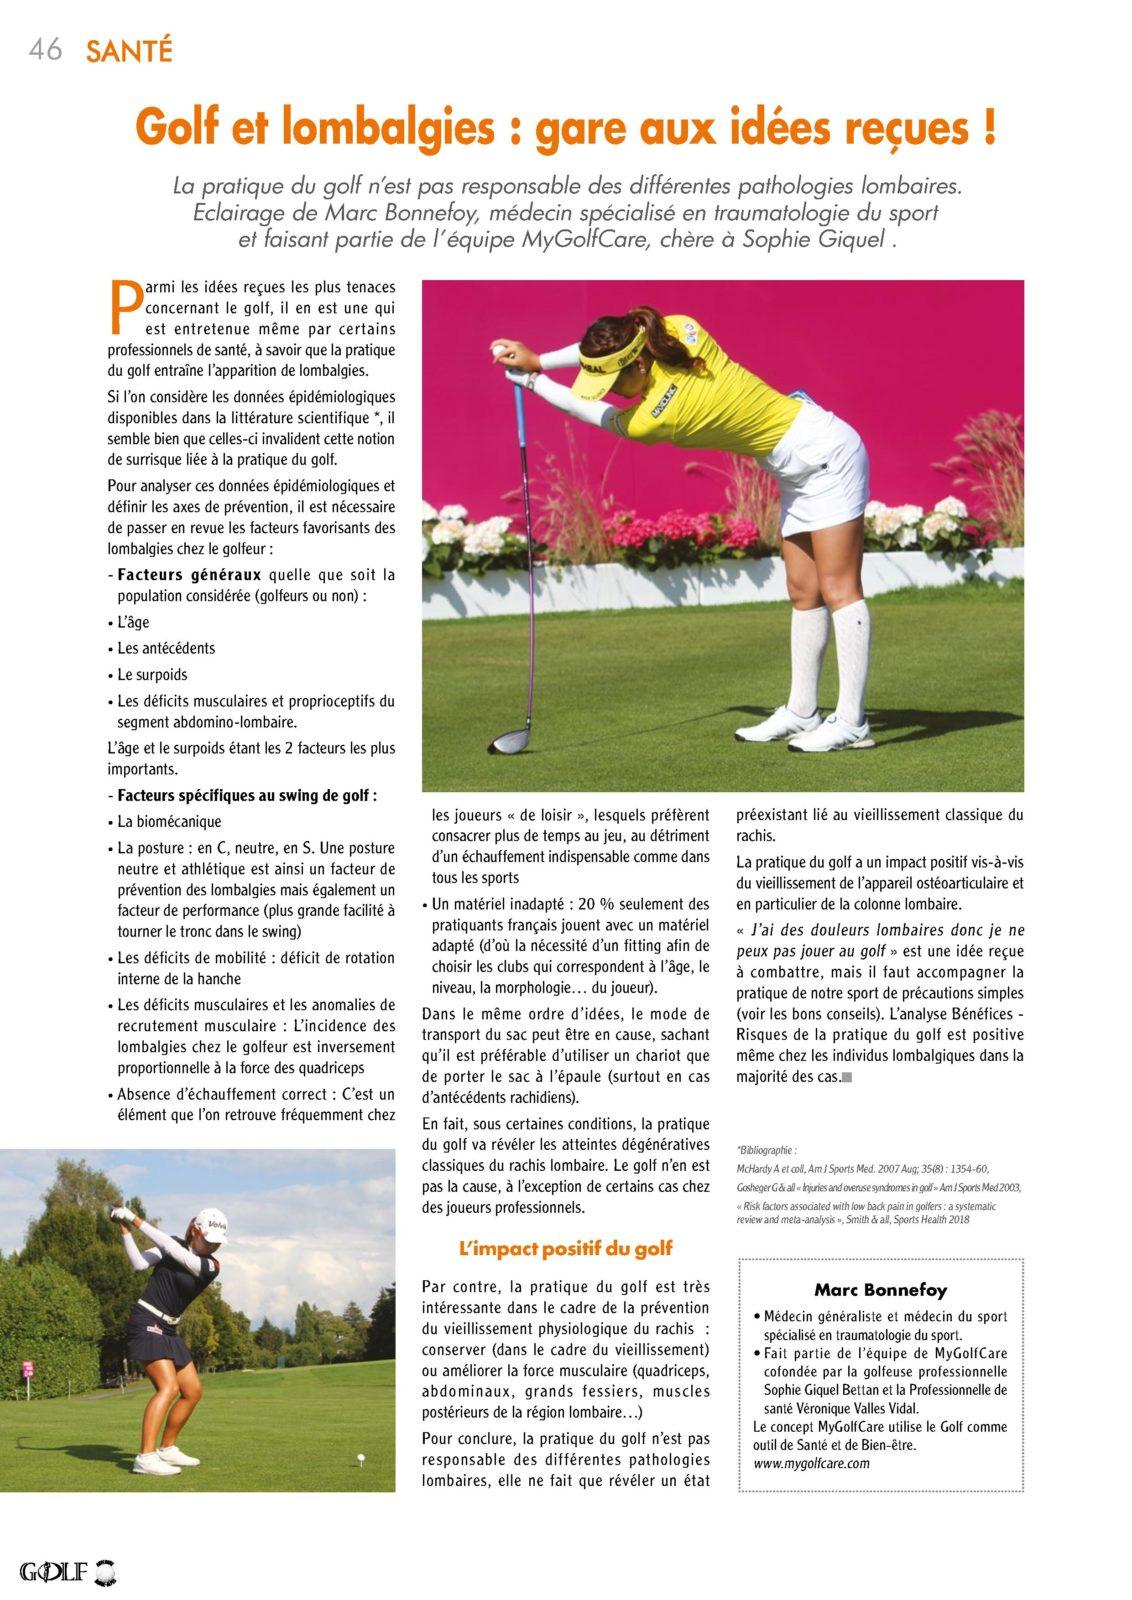 Golf - Lombalgie - Sport - Santé